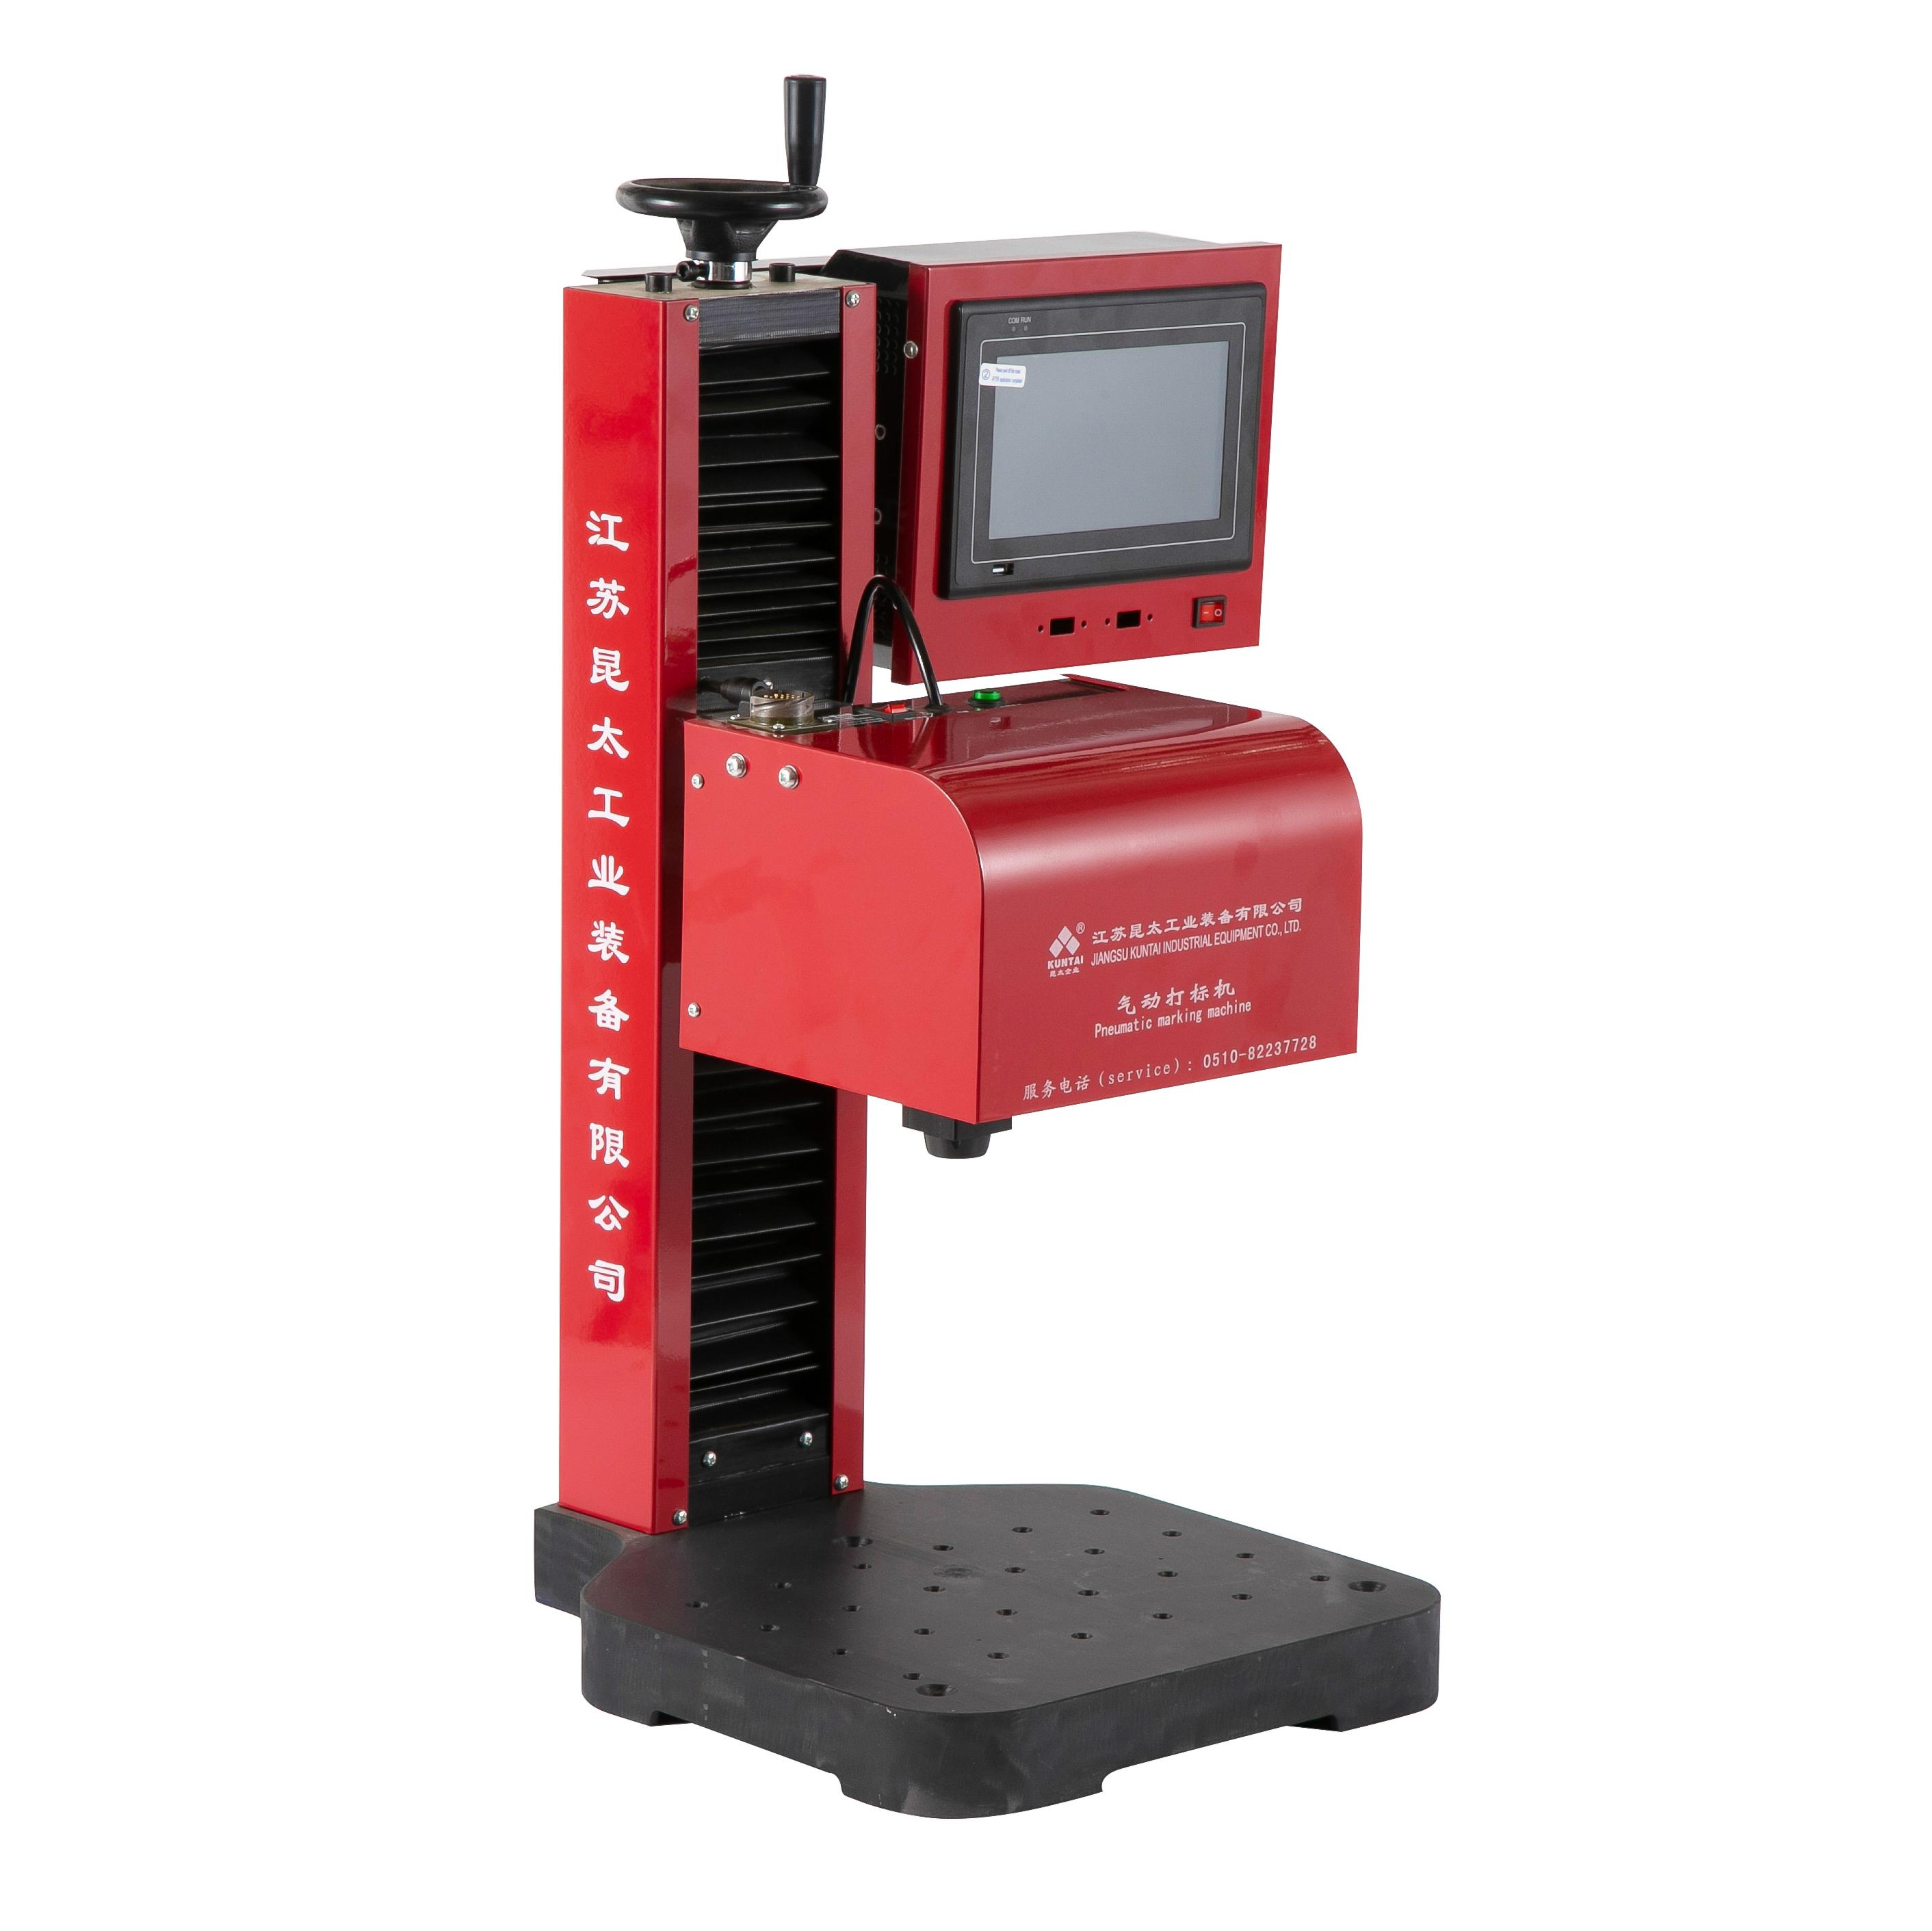 Desktop or portable line or dot peen pneumatic hand held marking machine